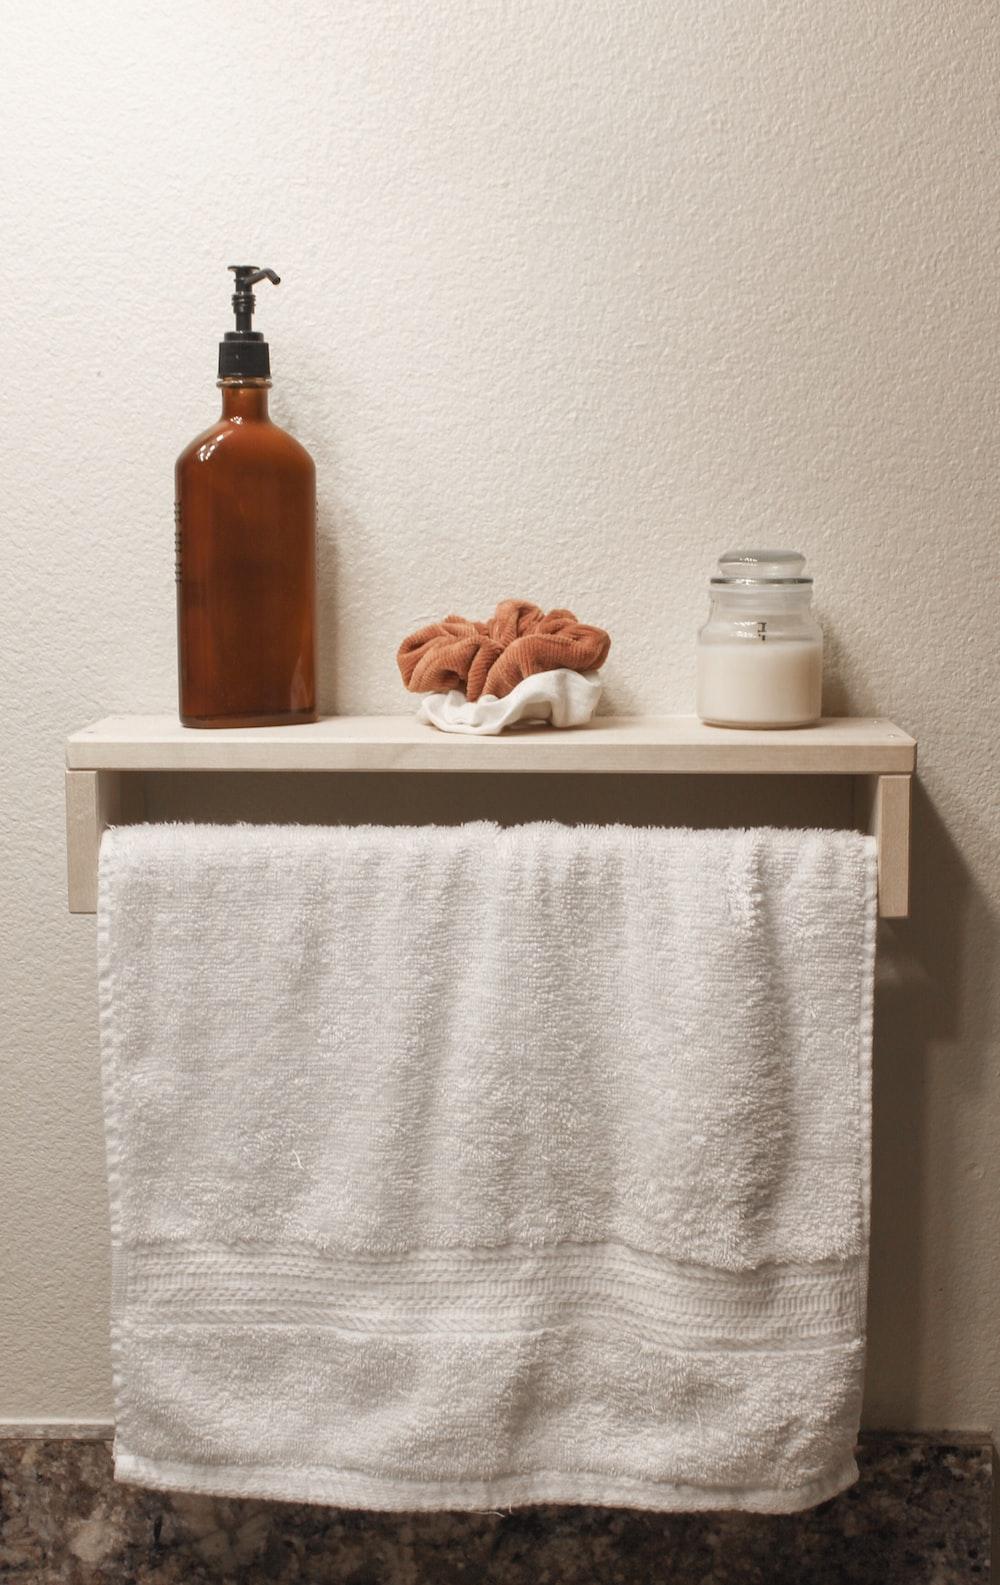 brown bottle on white towel